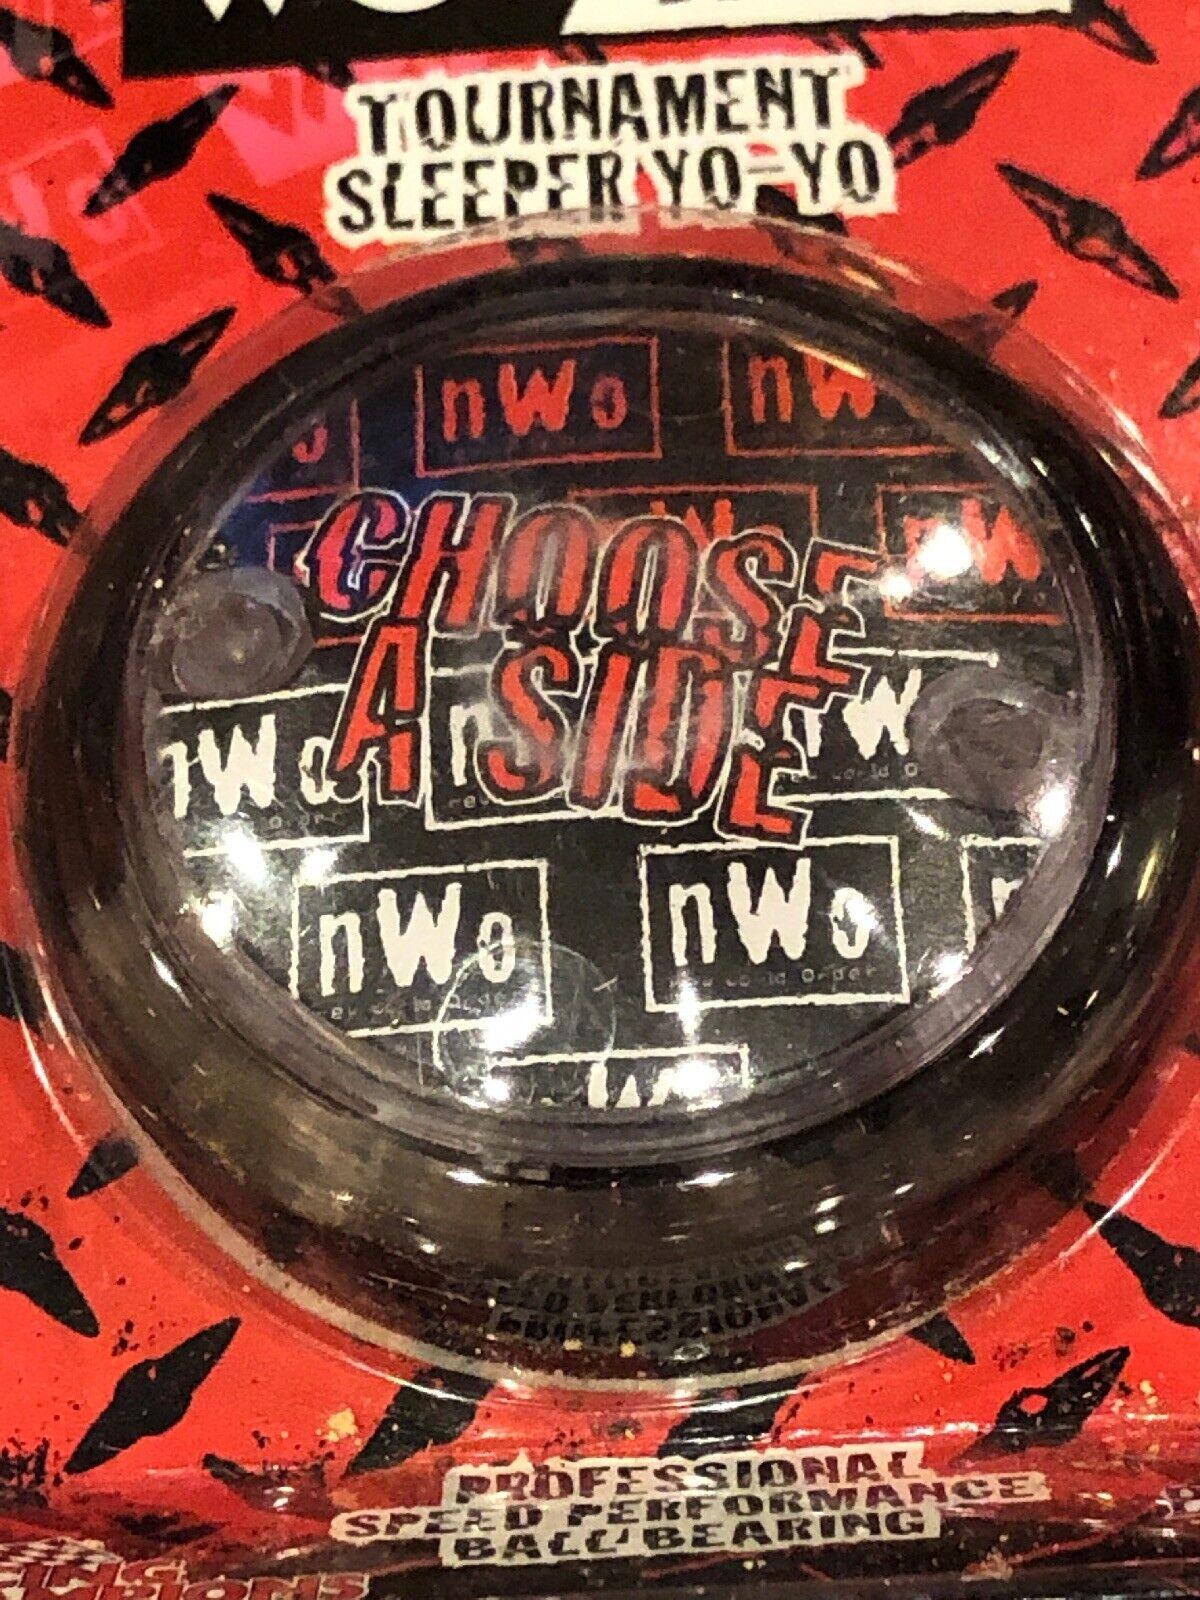 Goldberg WCW nWo Tournament Sleeper Yo-Yo